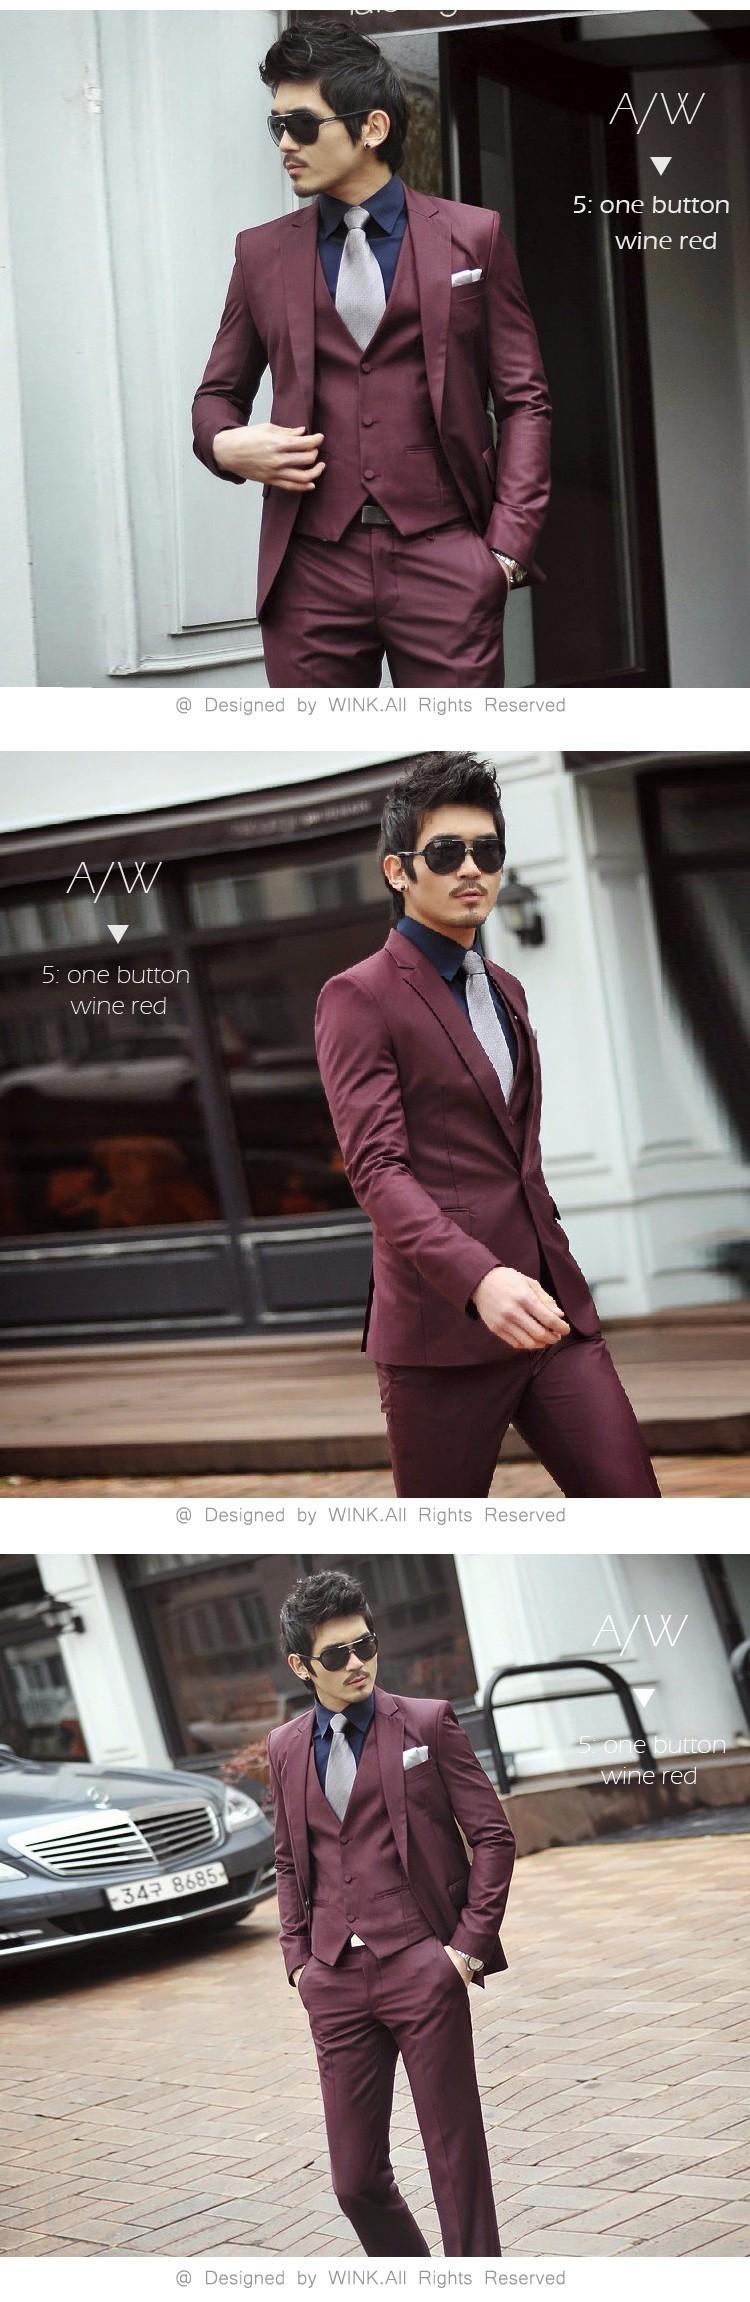 HTB1uGr LVXXXXXnXpXXq6xXFXXXr - (Jacket+Pant+Tie) Men Wedding Suit Sets Tuxedo Formal Fashion Slim Fit Business Dress Suits Blazer Brand Party Masculino Suits